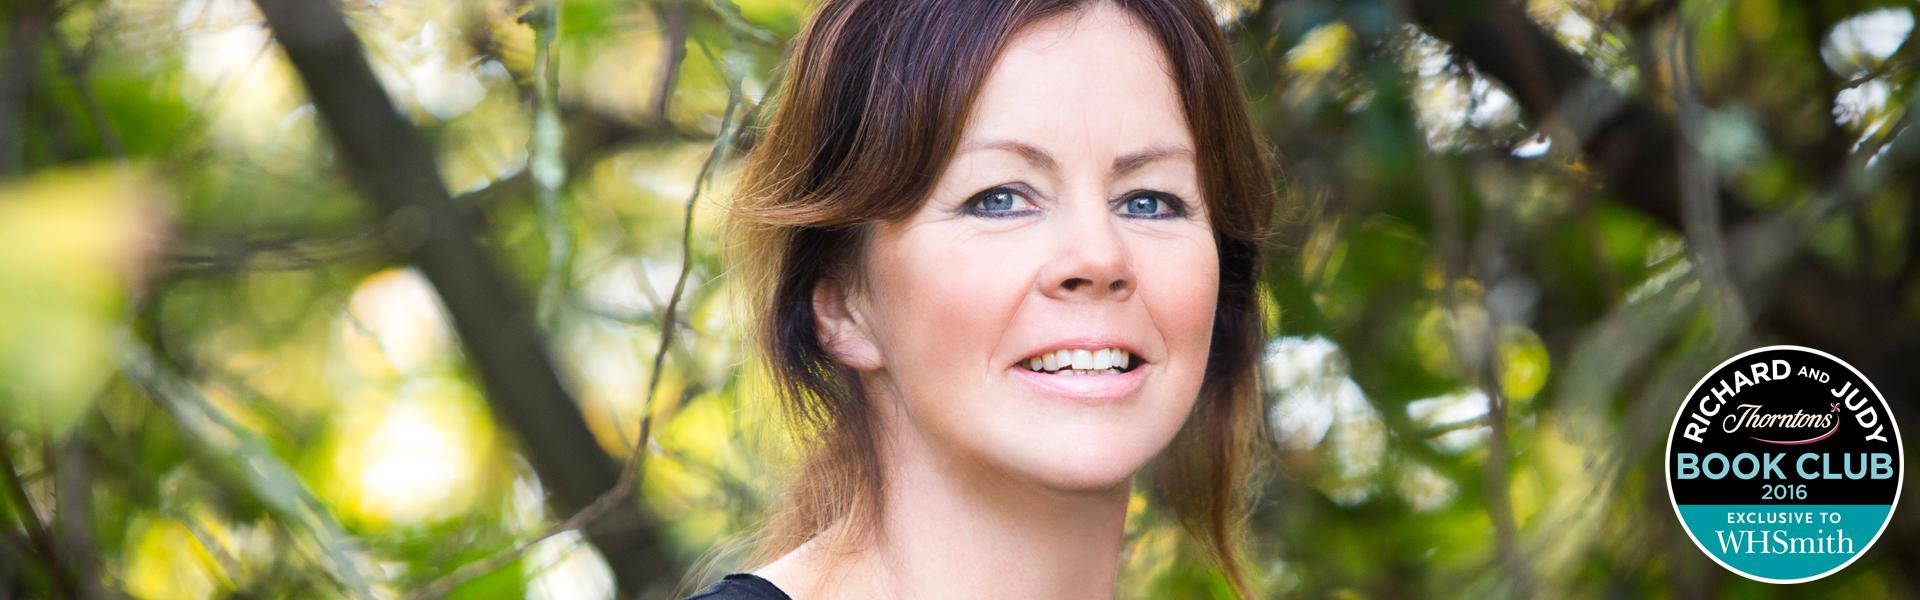 Debbie Howells: Small Town Secrets